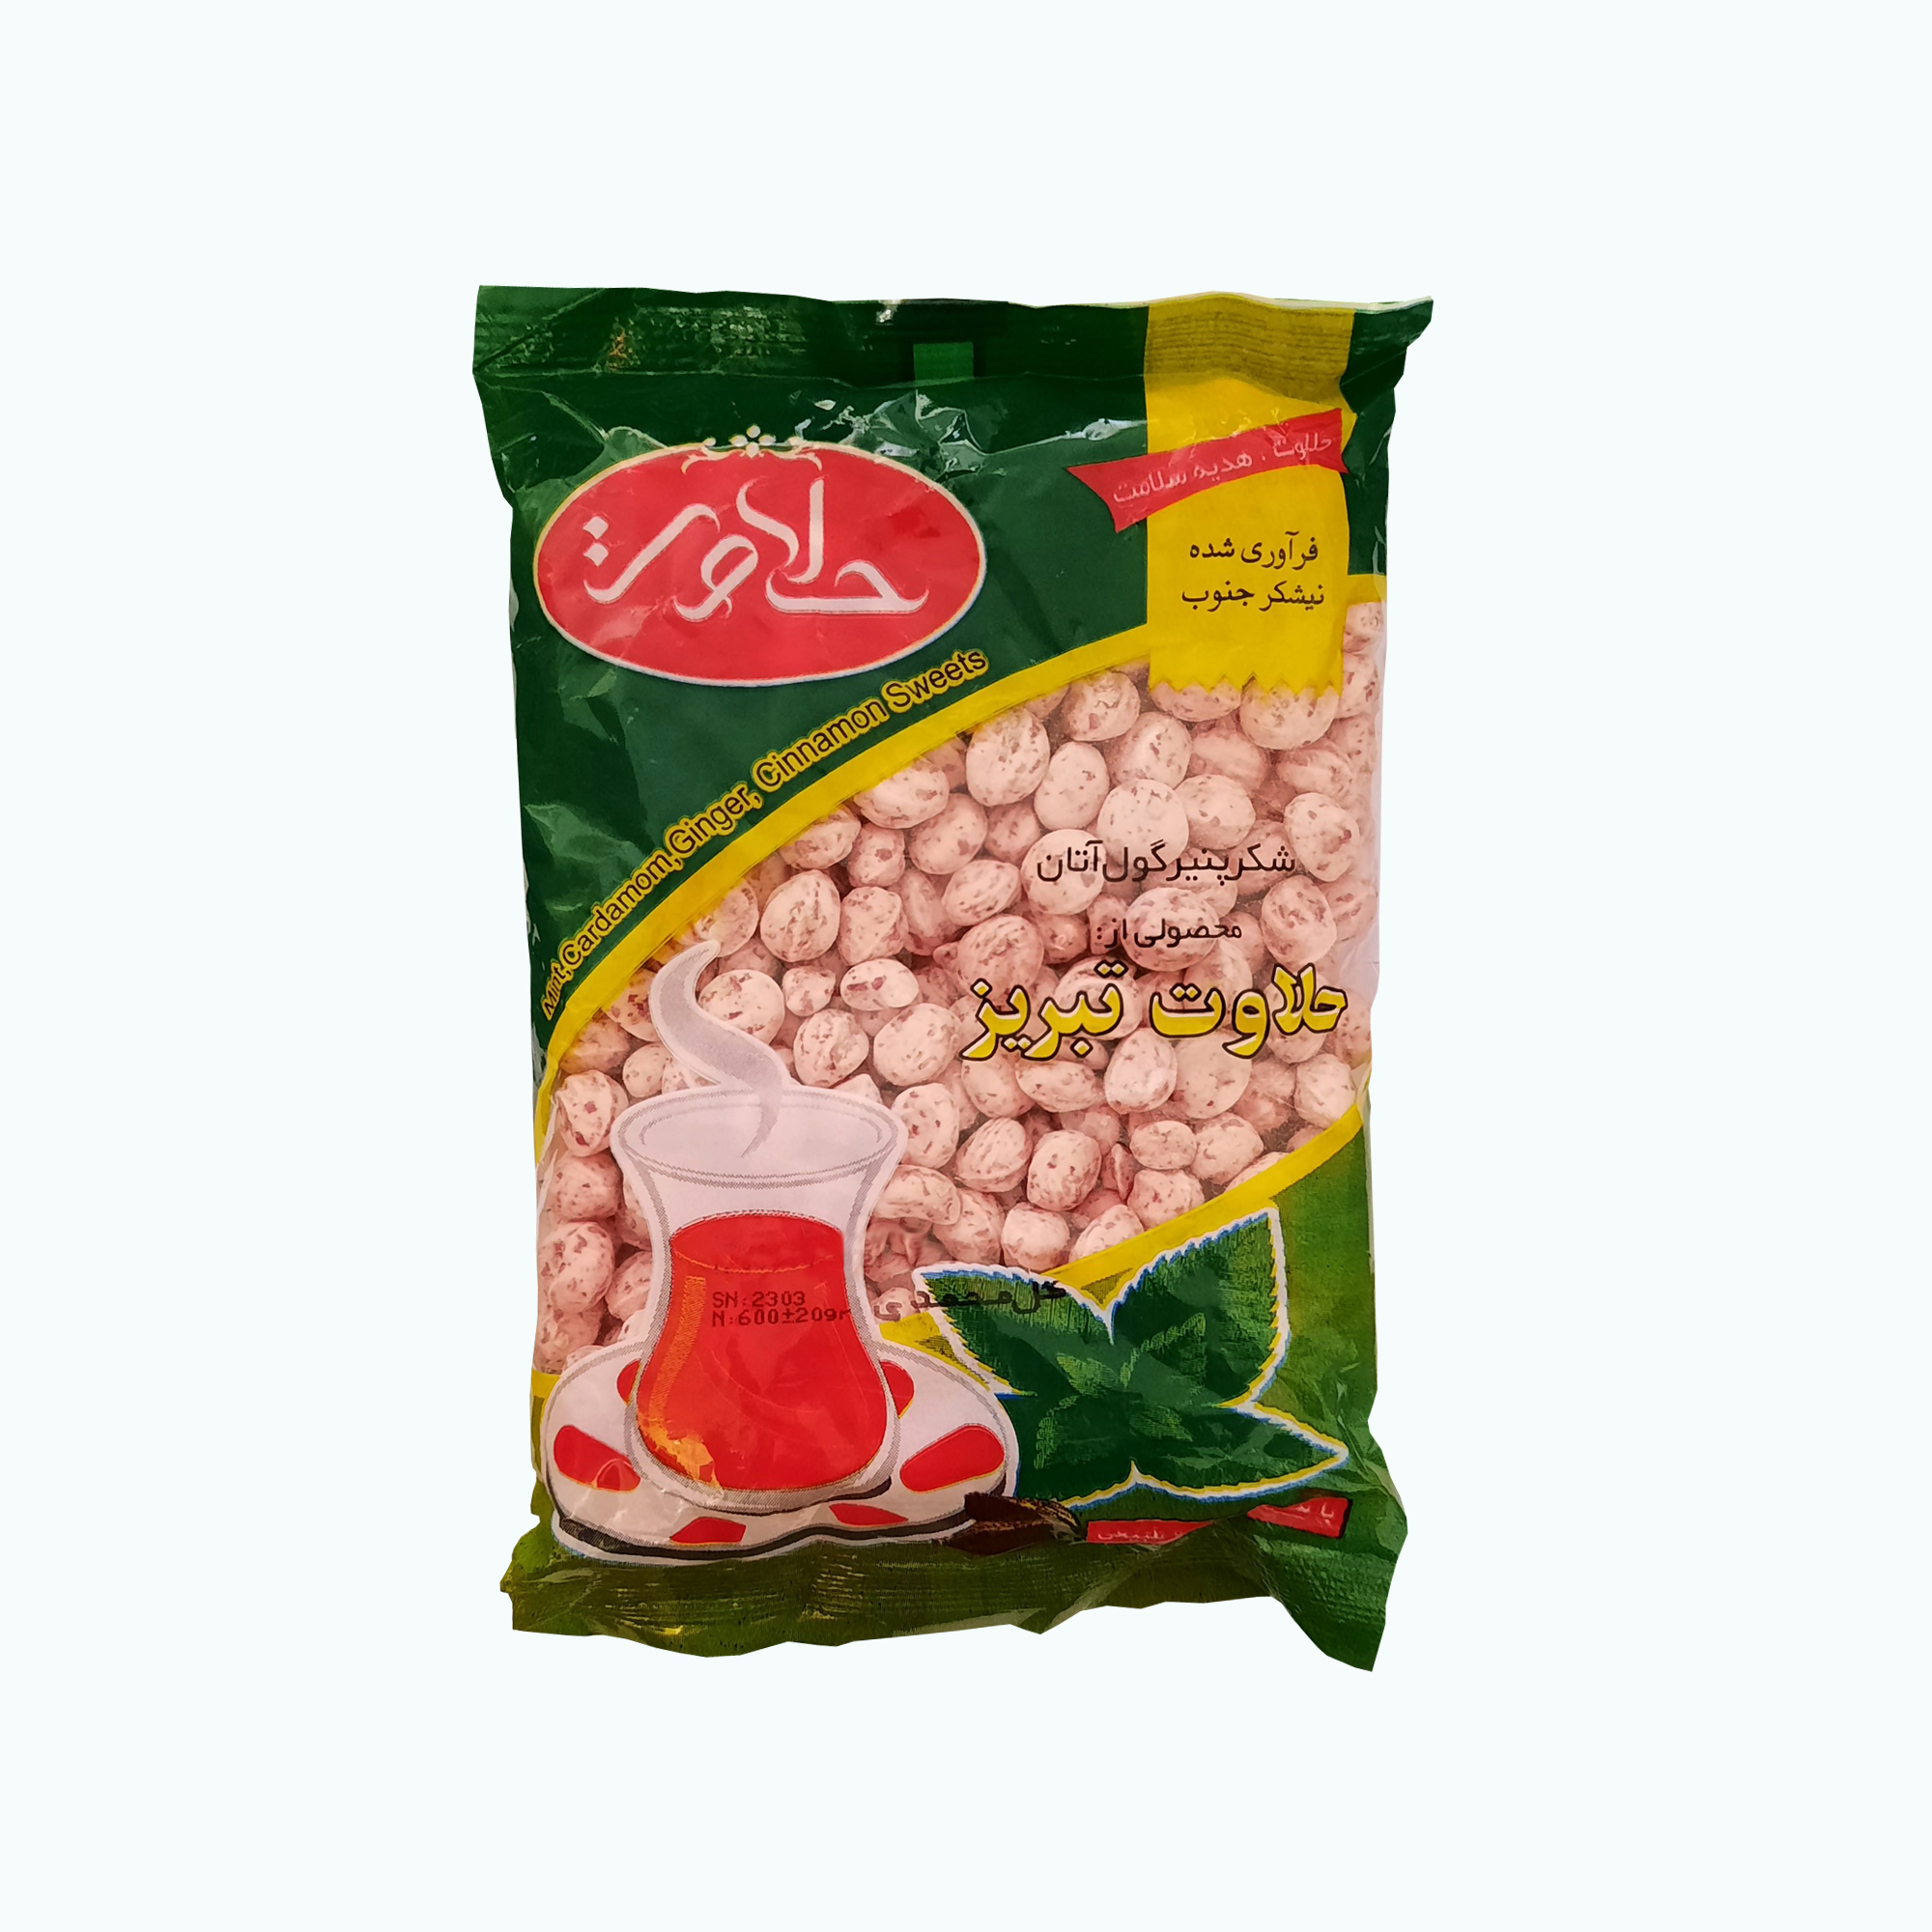 شکر پنیر طبیعی  گل محمدی حلاوت تبریز - 600 گرم